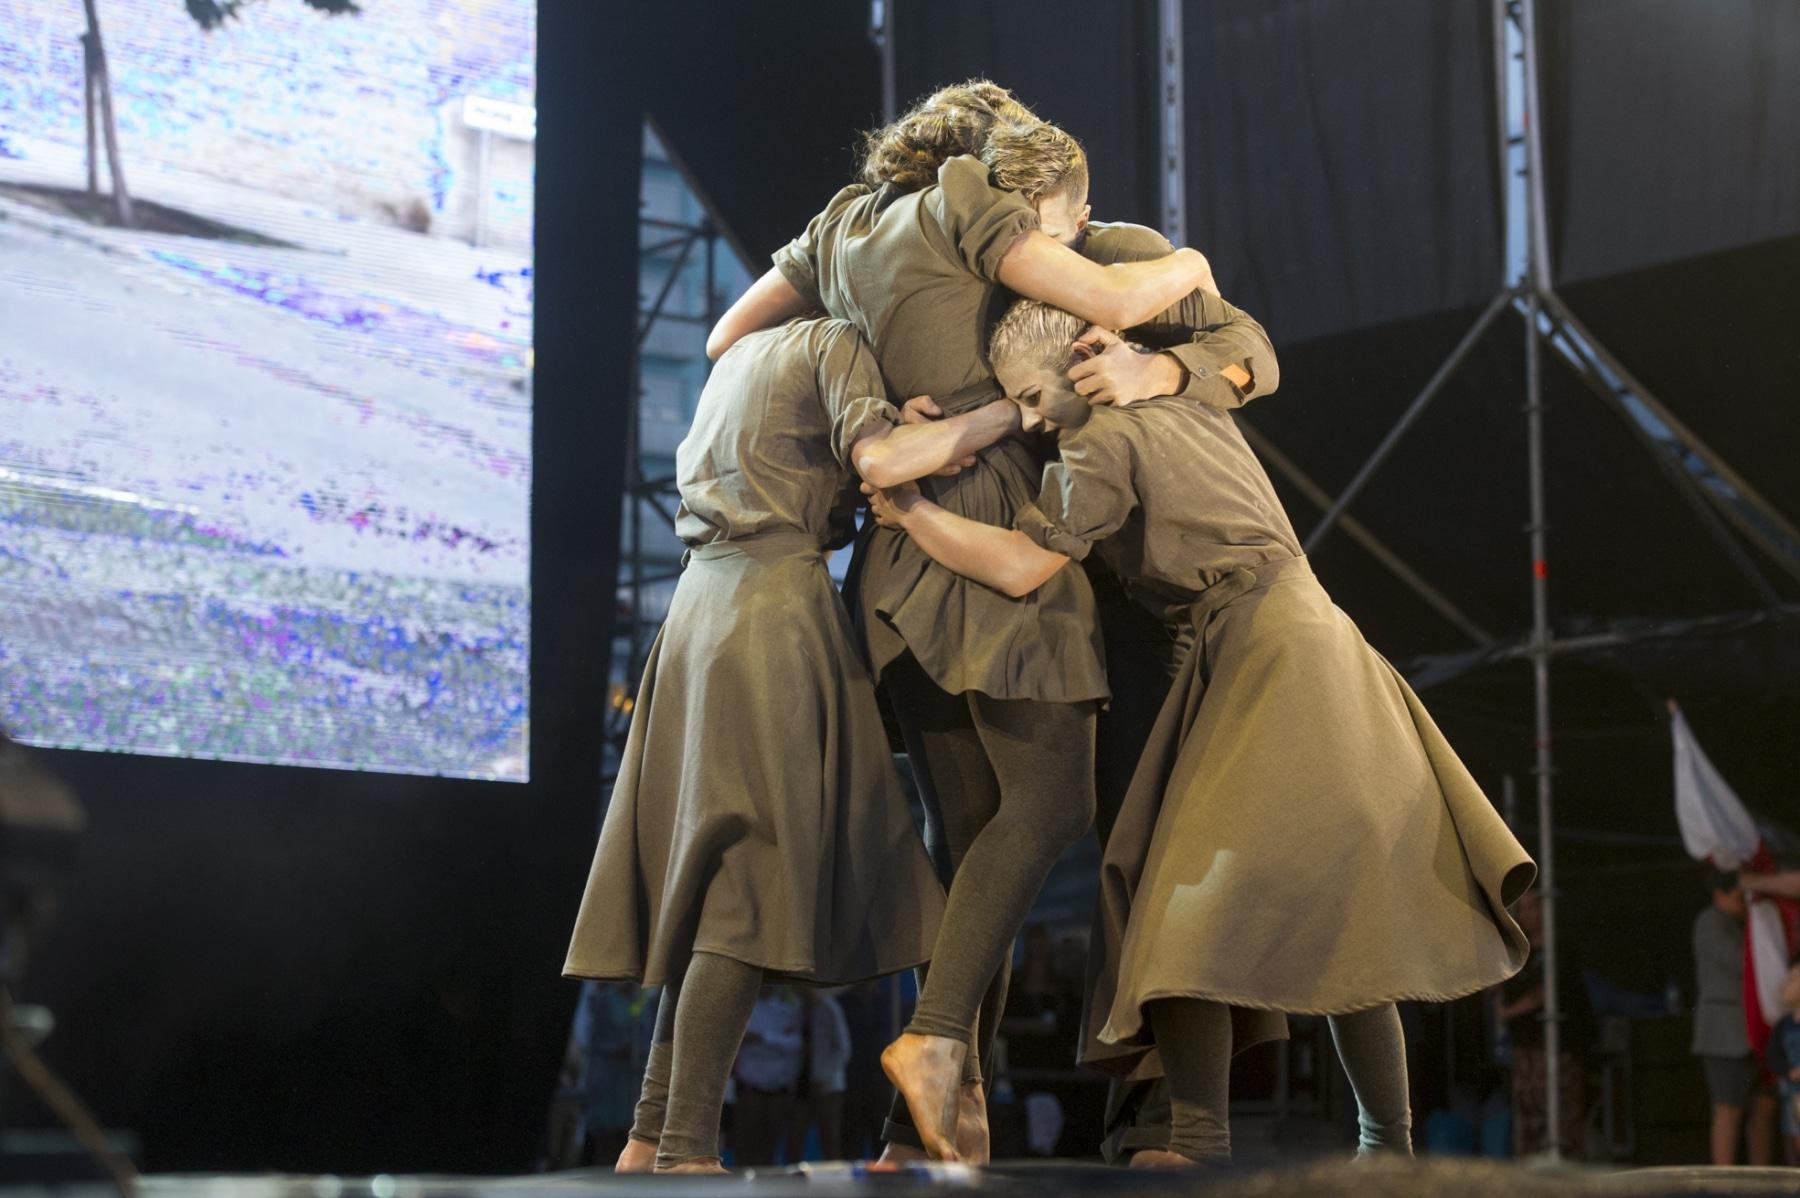 concierto-evacuados-de-gibraltar-07092015-60bn_21228477932_o